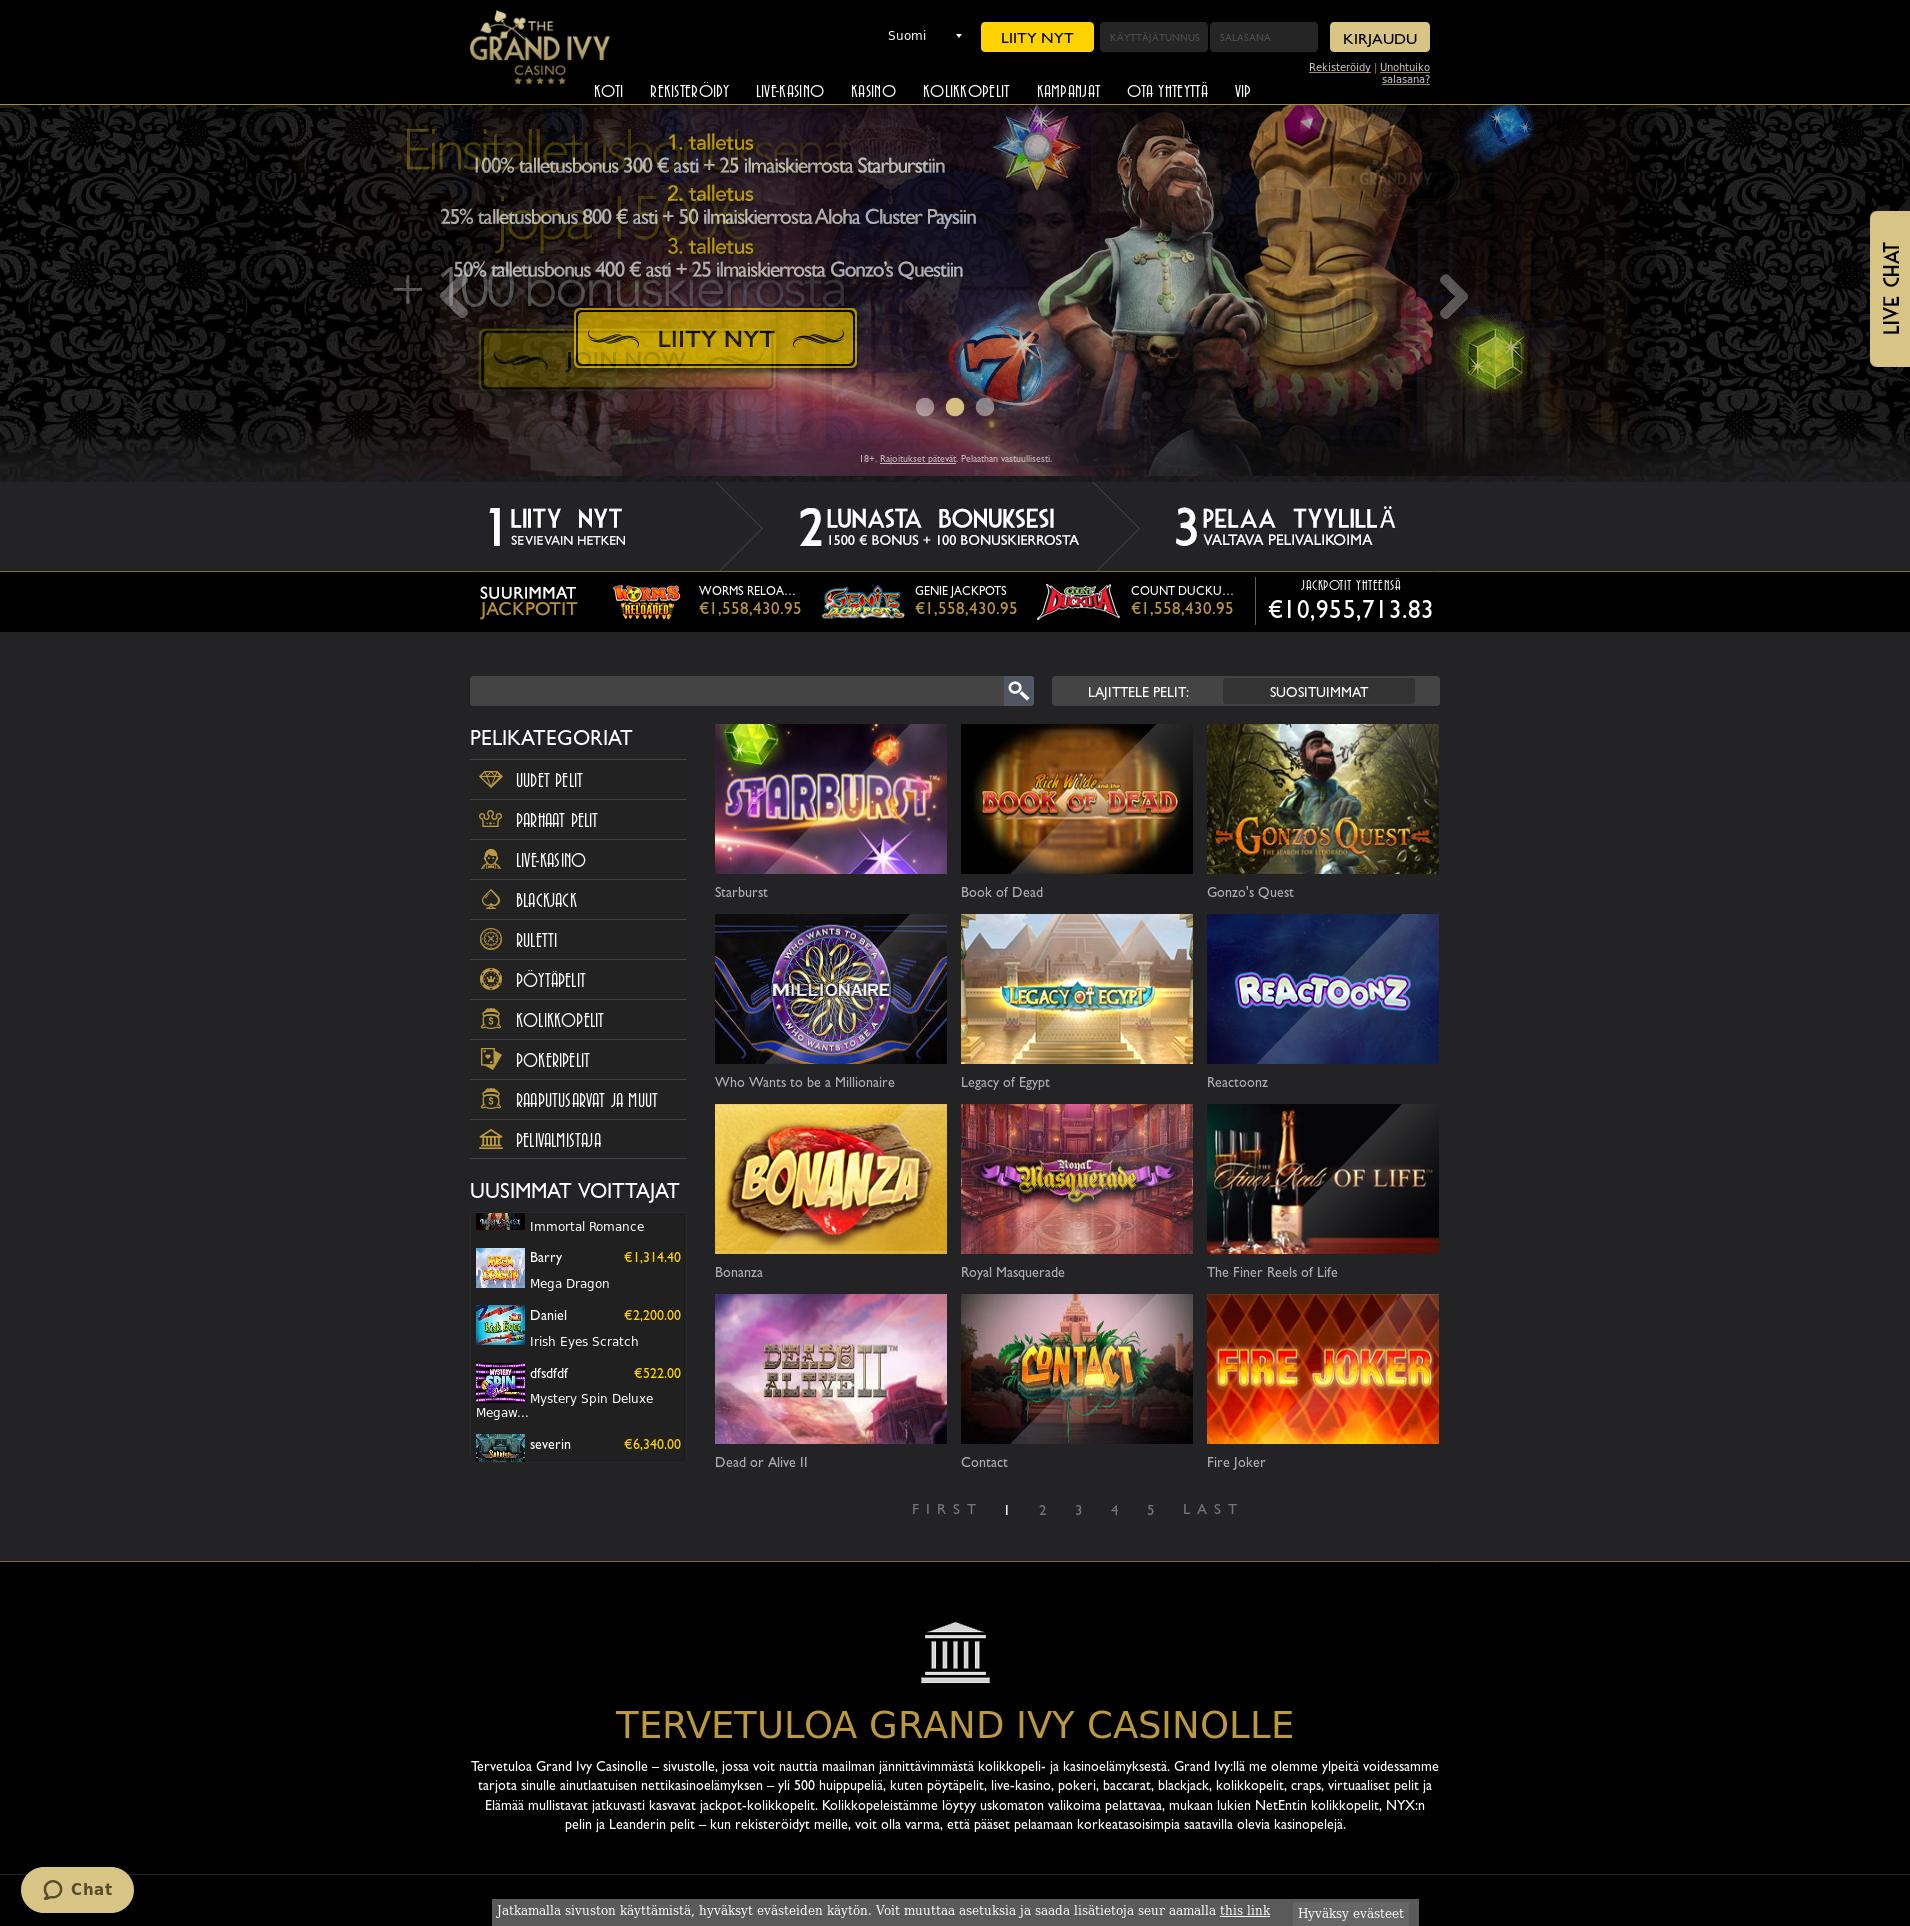 Casino screen Lobby 2019-10-20 for Finland